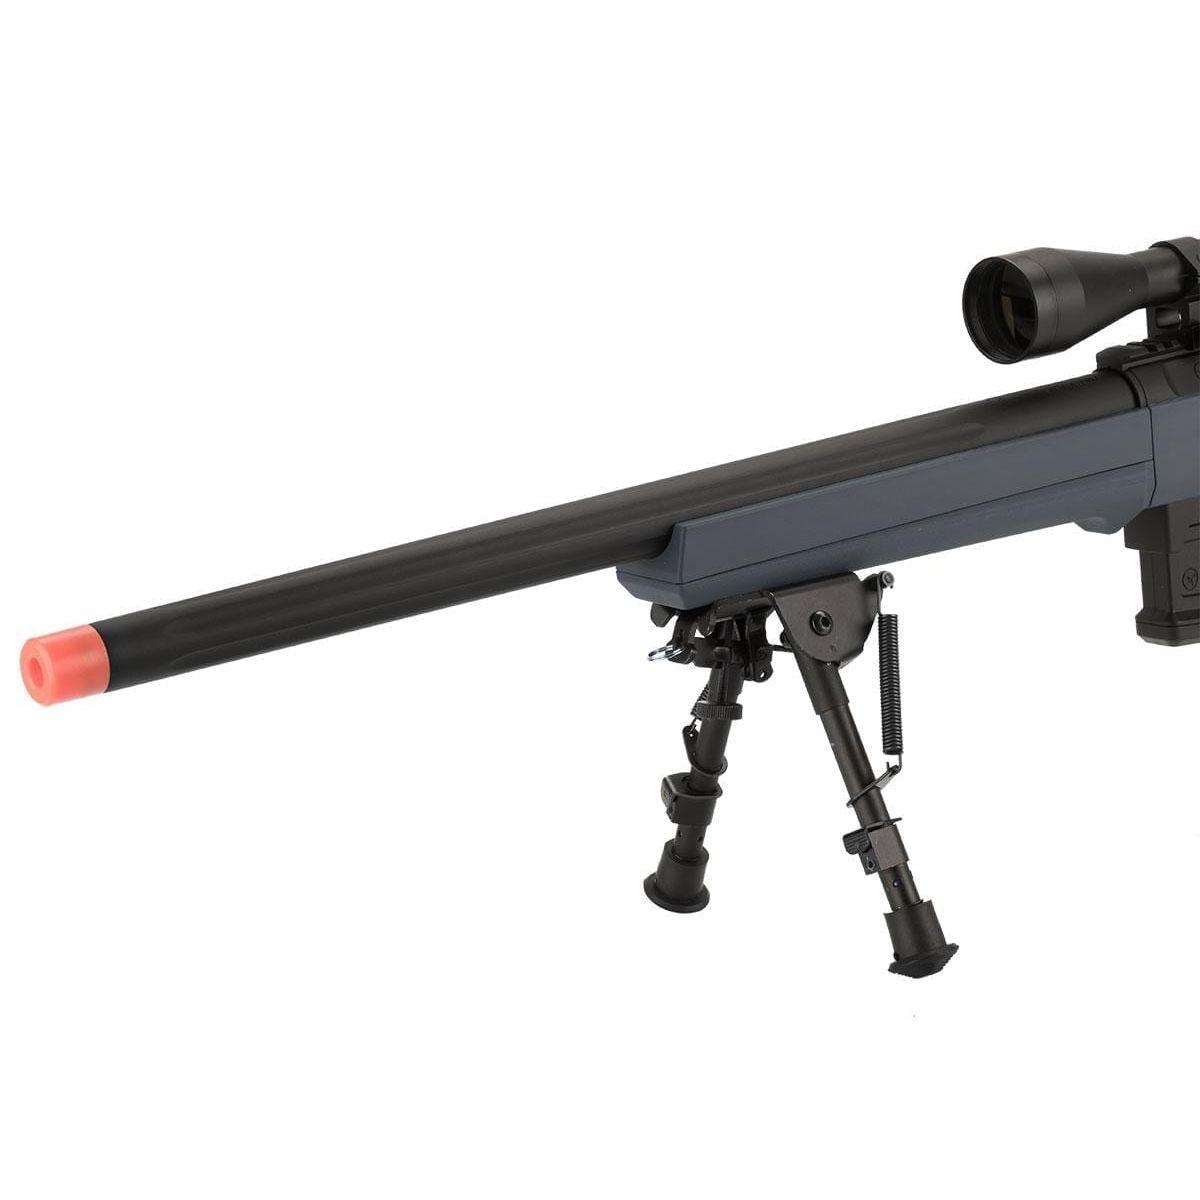 S1 Gen2 Bolt Action Sniper Rifle grey